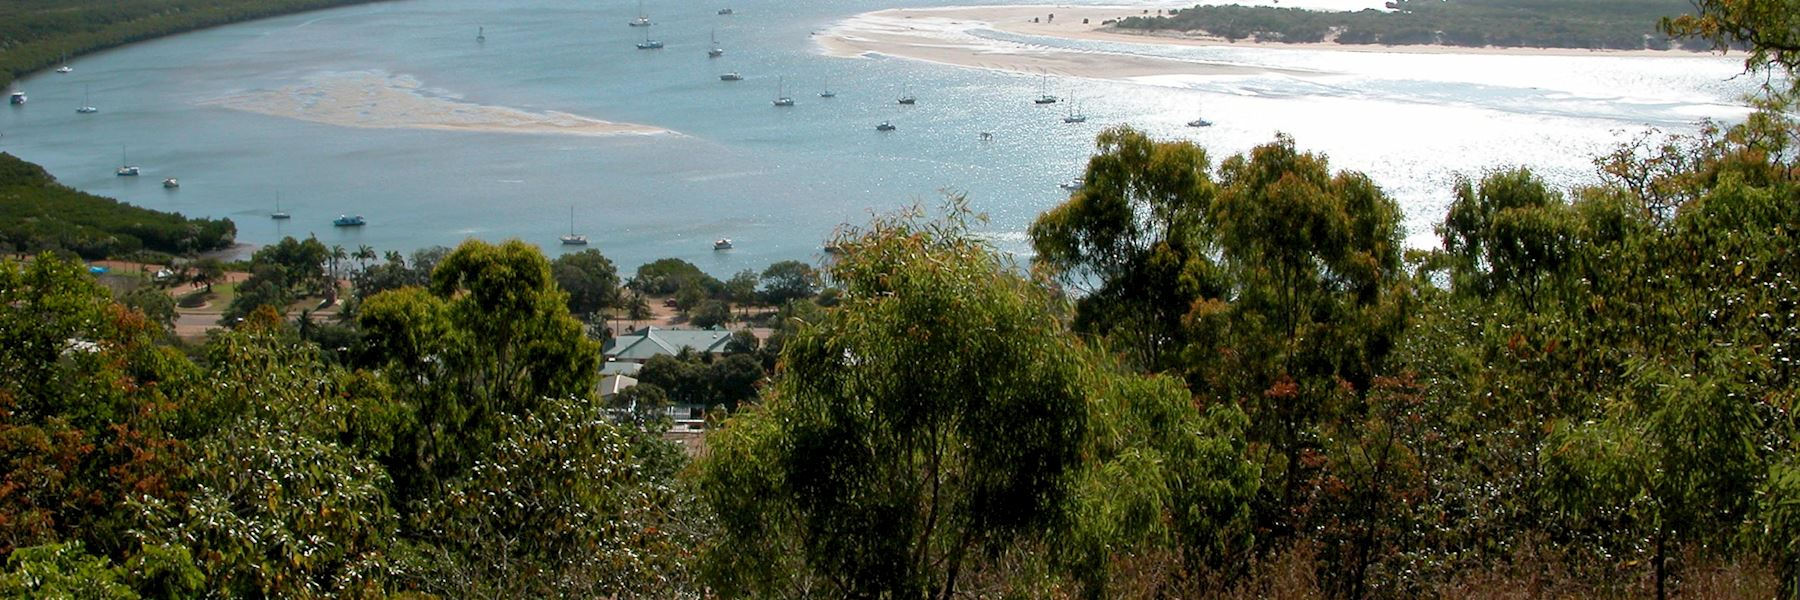 Visit Cooktown, Australia